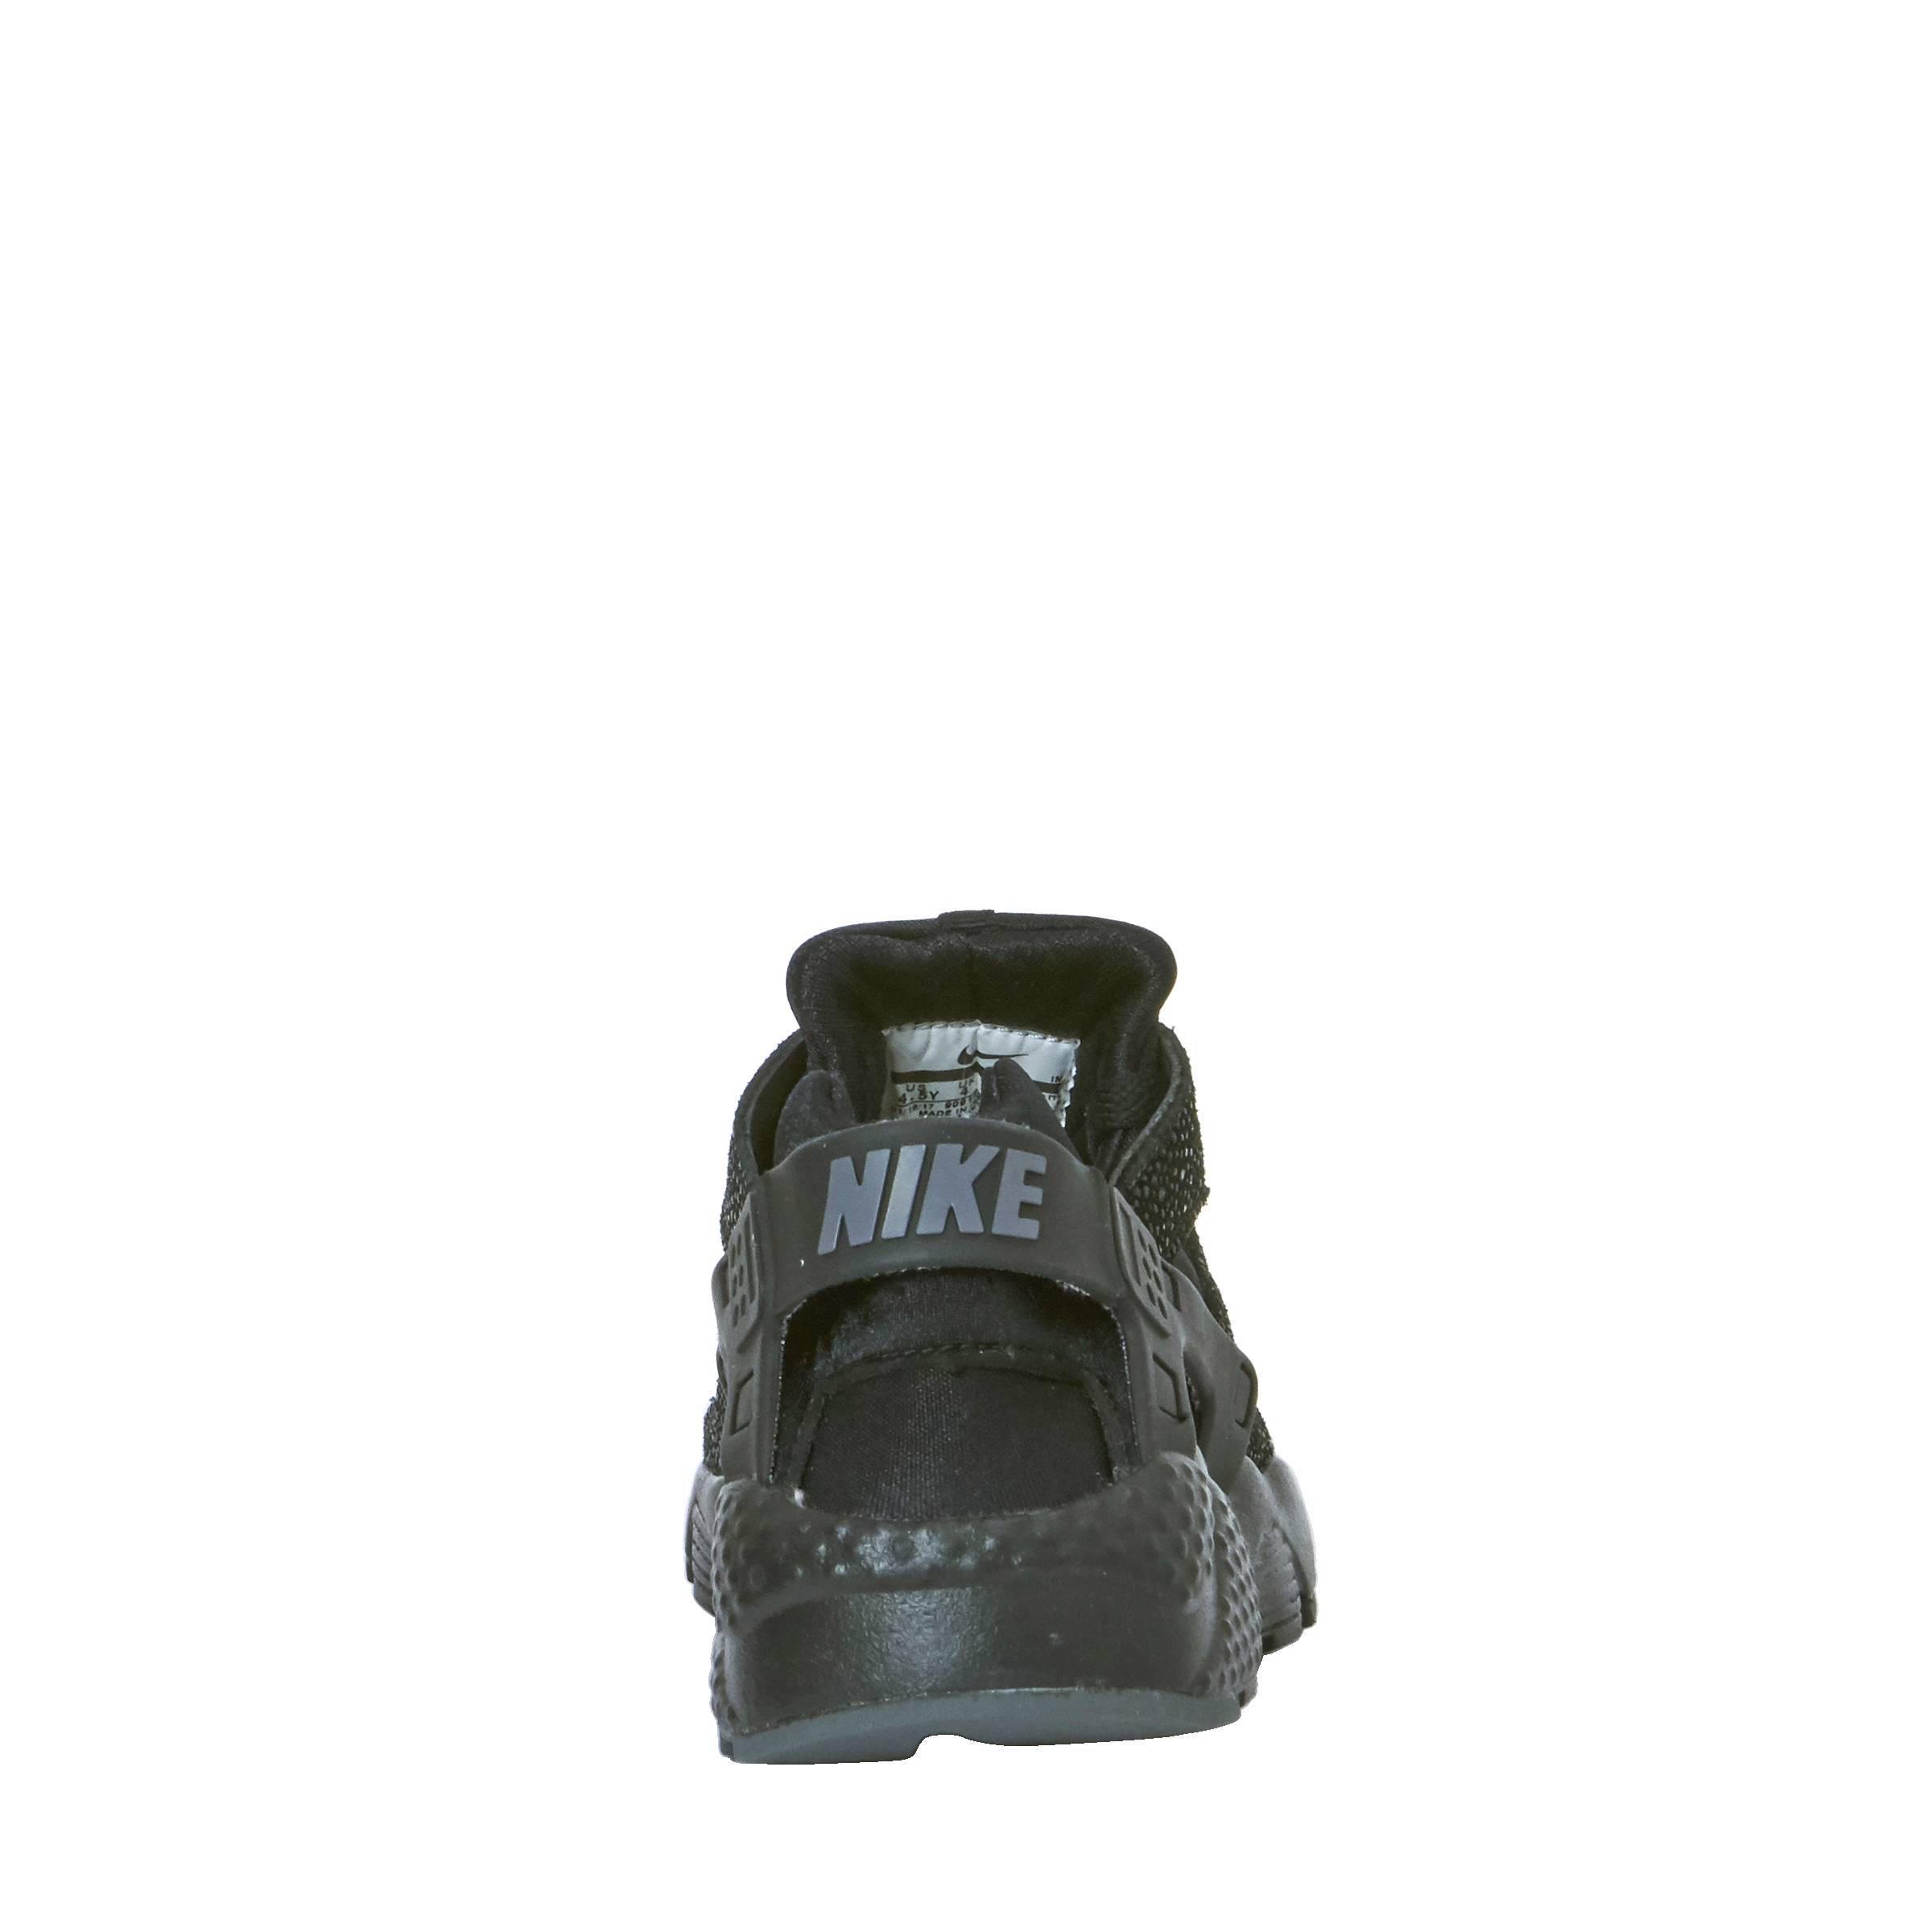 9fa313018b0 nike-sneakers-huarache-run-se-zwart-0886551144369.jpg